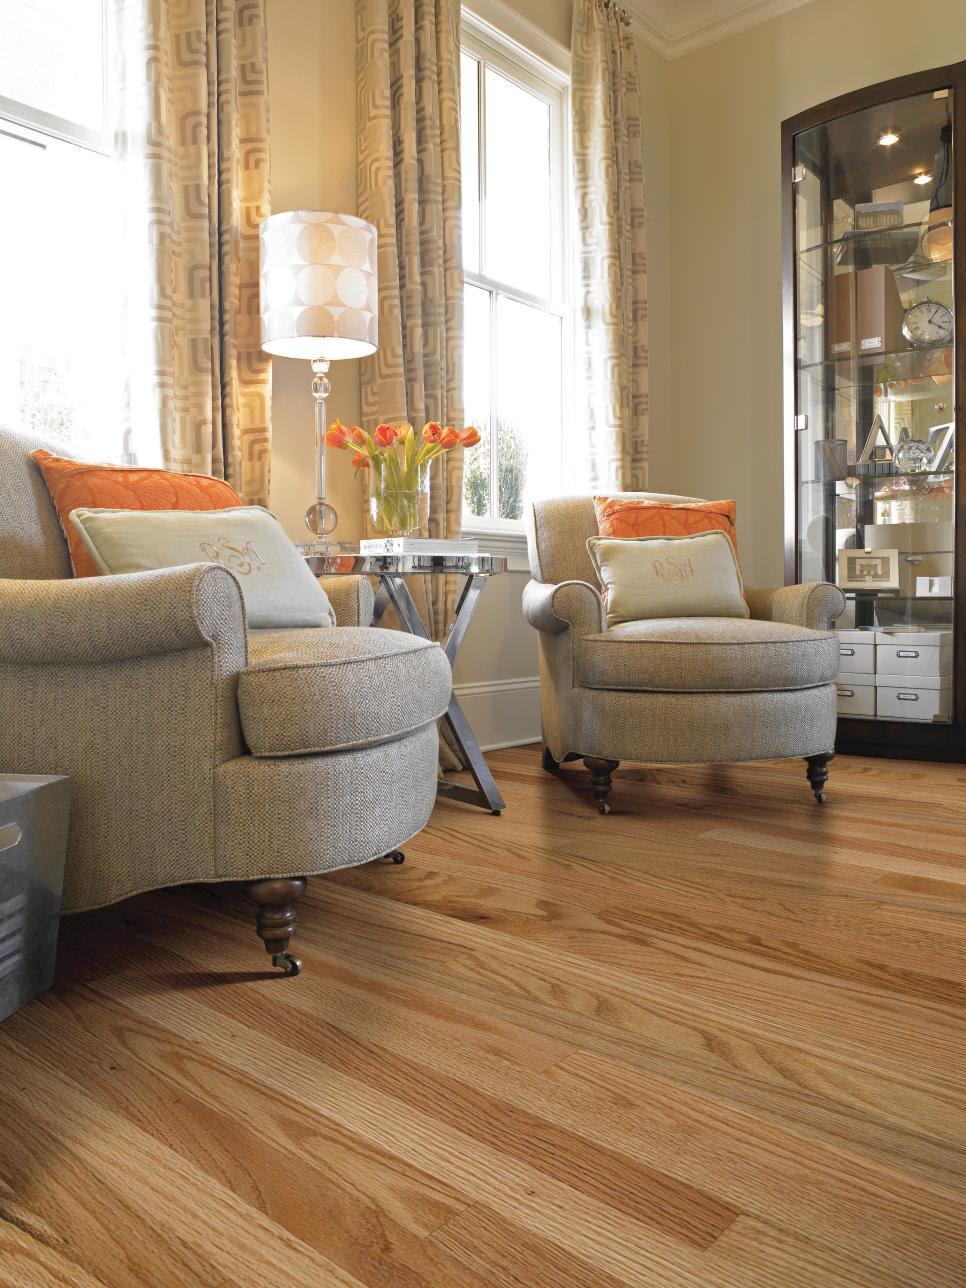 10 Stunning Hardwood Flooring Options | HGTV